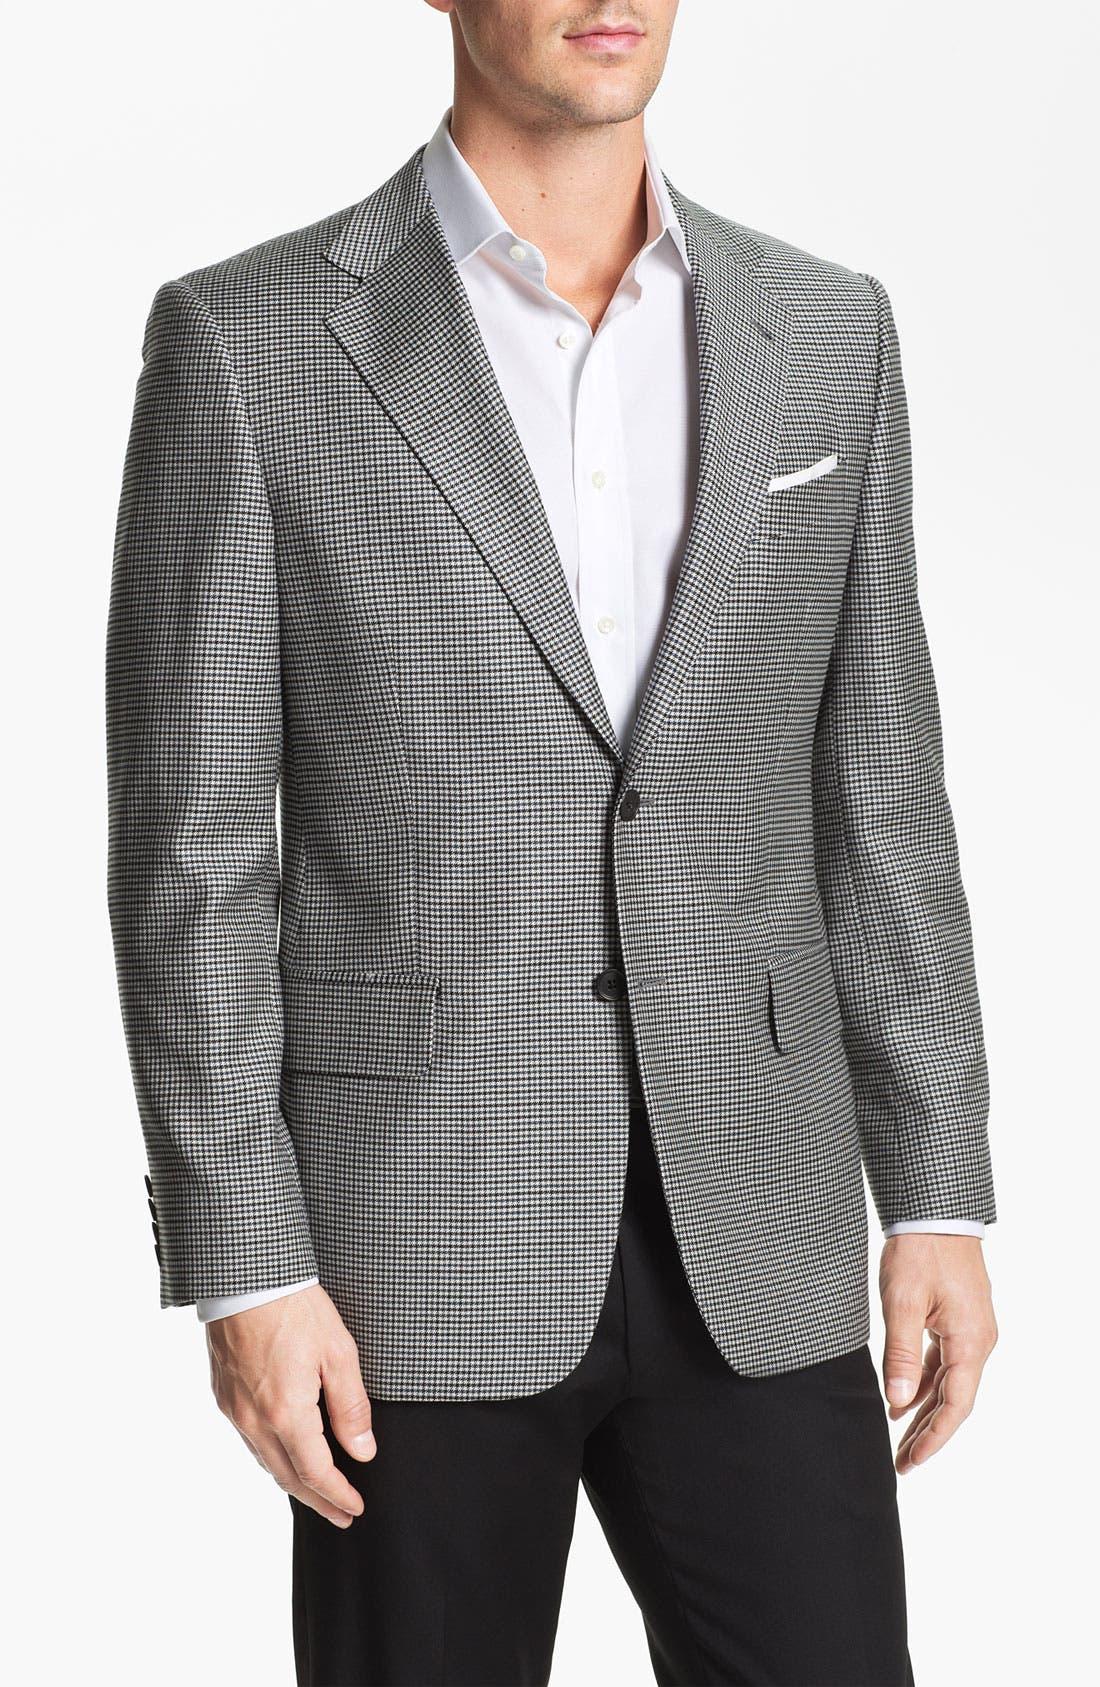 Alternate Image 1 Selected - Joseph Abboud Check Sportcoat